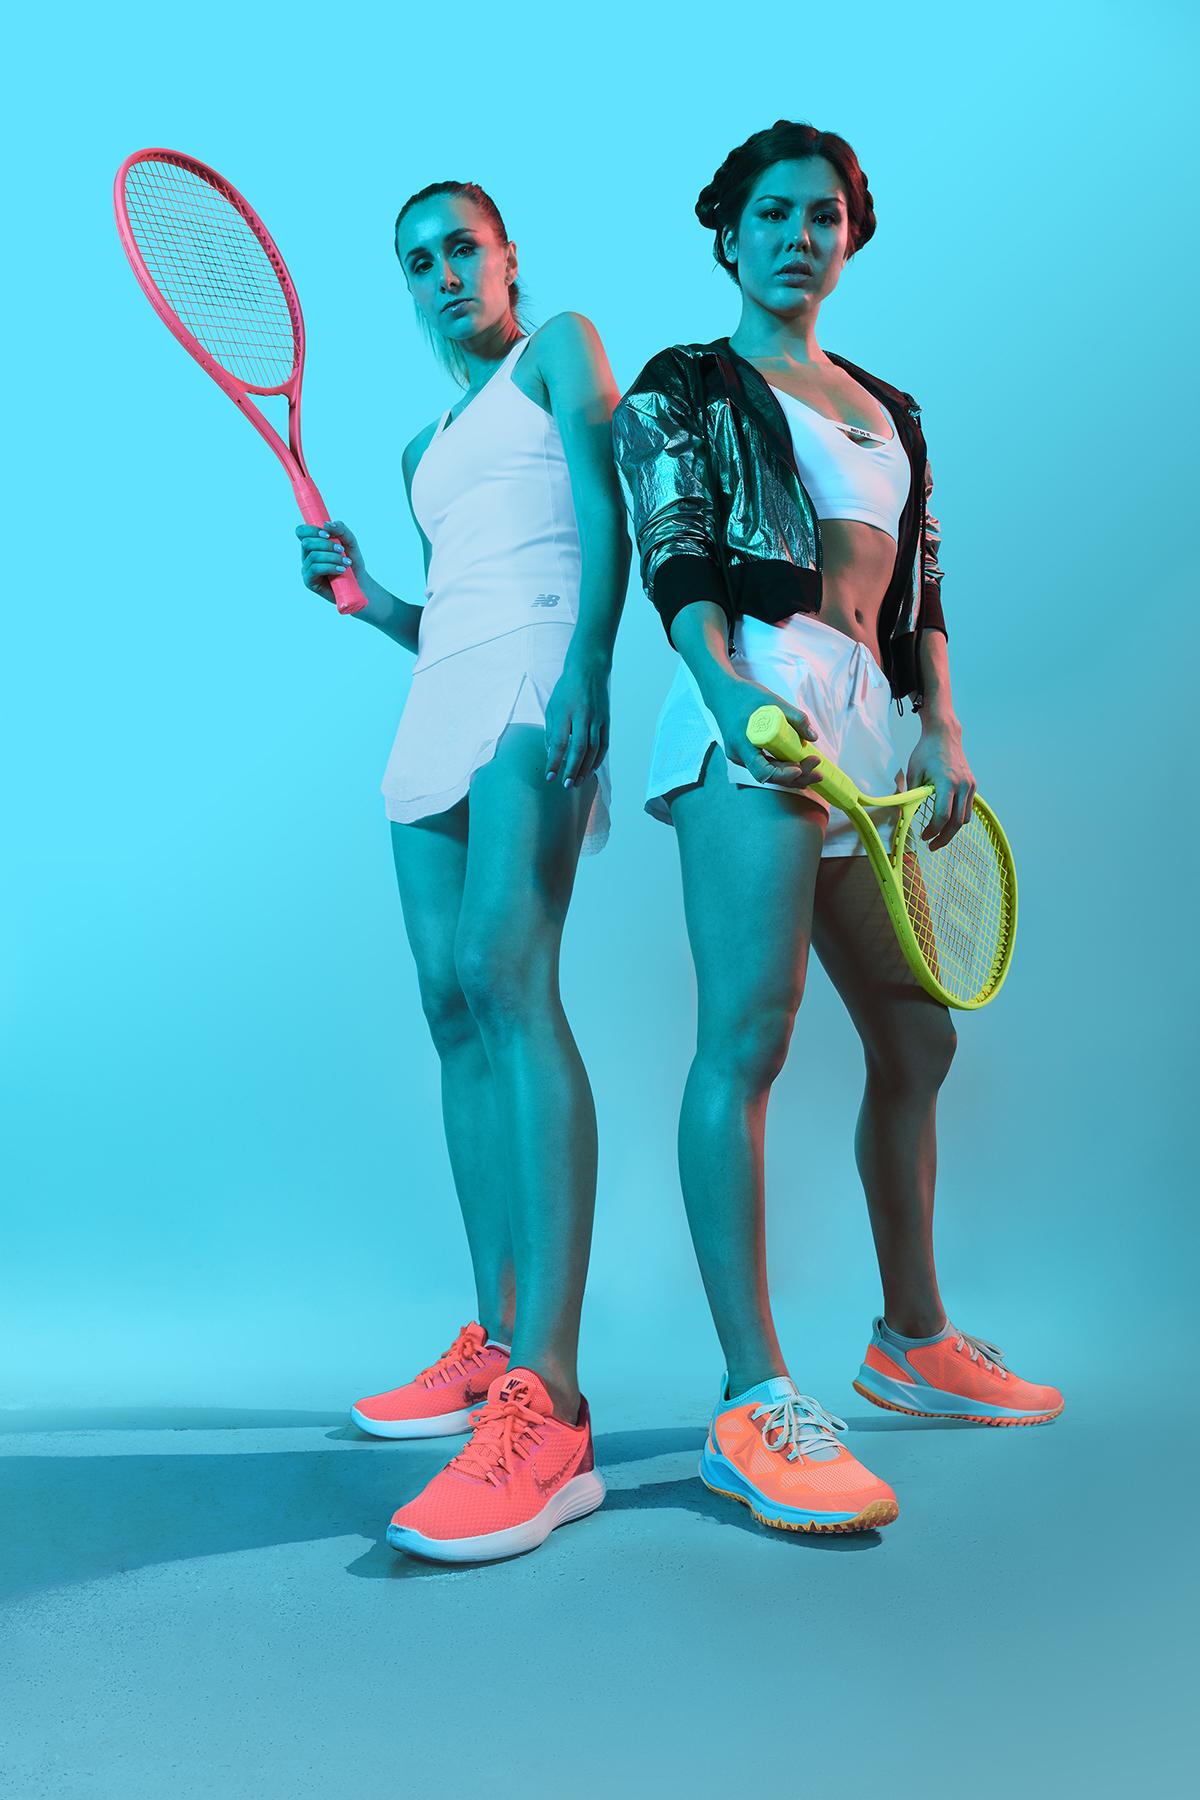 20181111_Tennis13000_FINAL_WEB.jpg